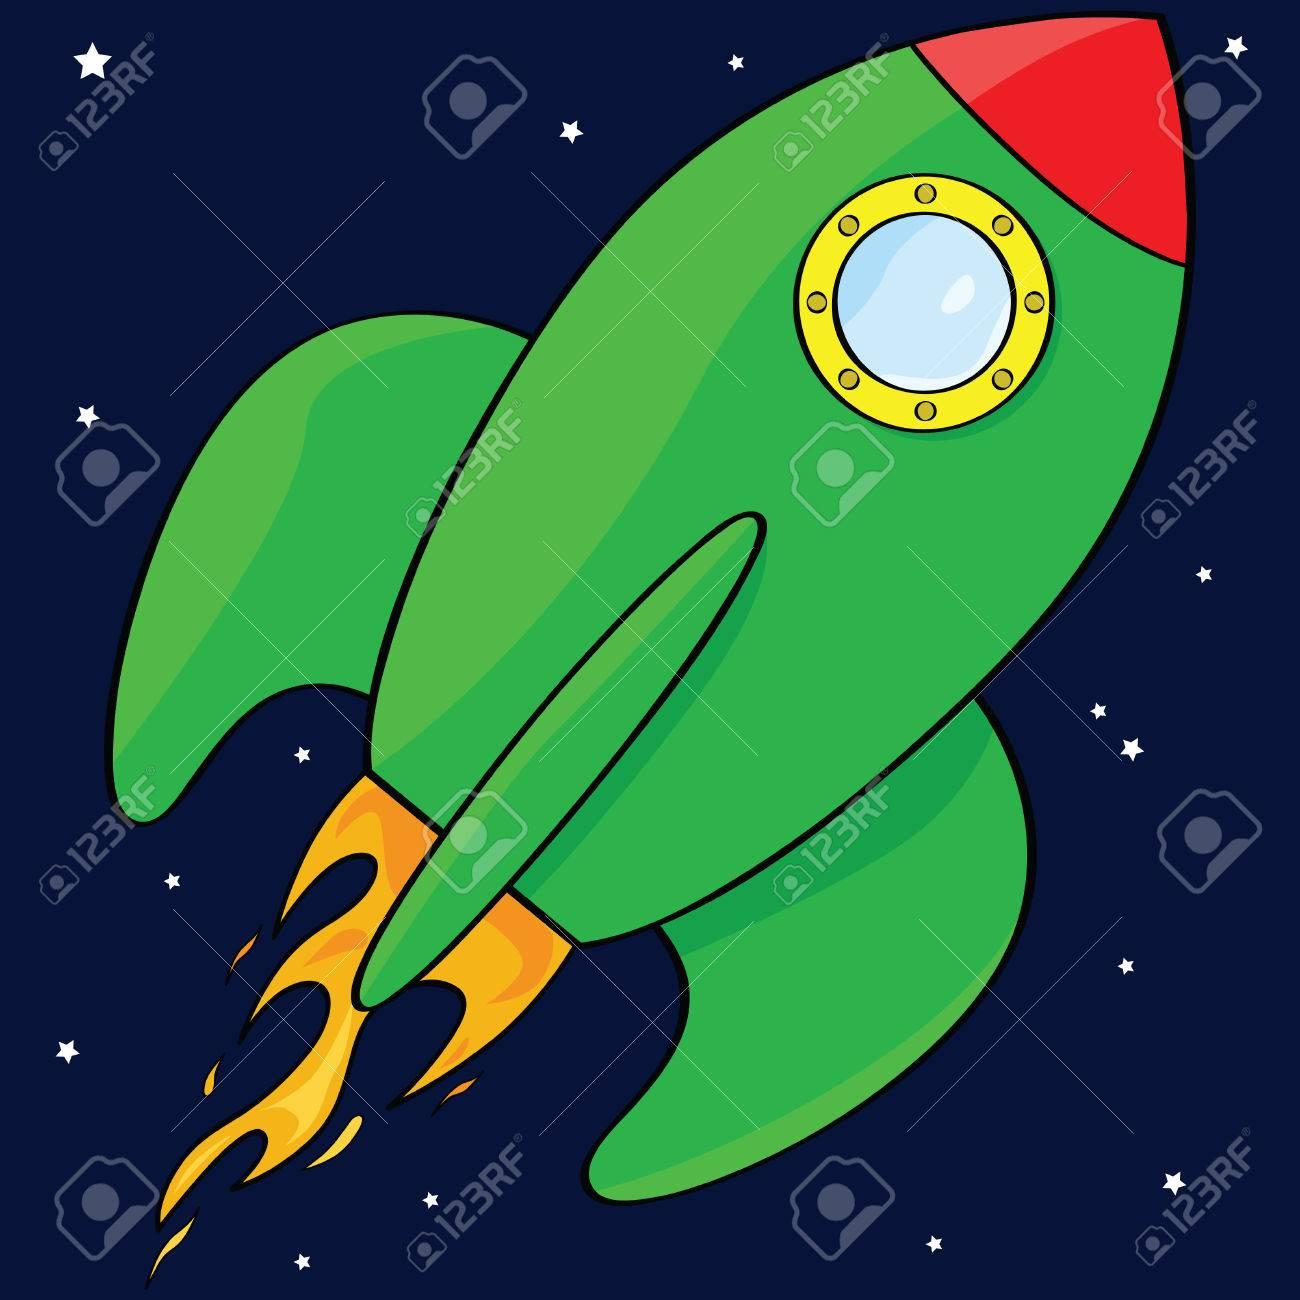 Cartoon illustration of a green rocket ship in space Stock Vector - 7420124